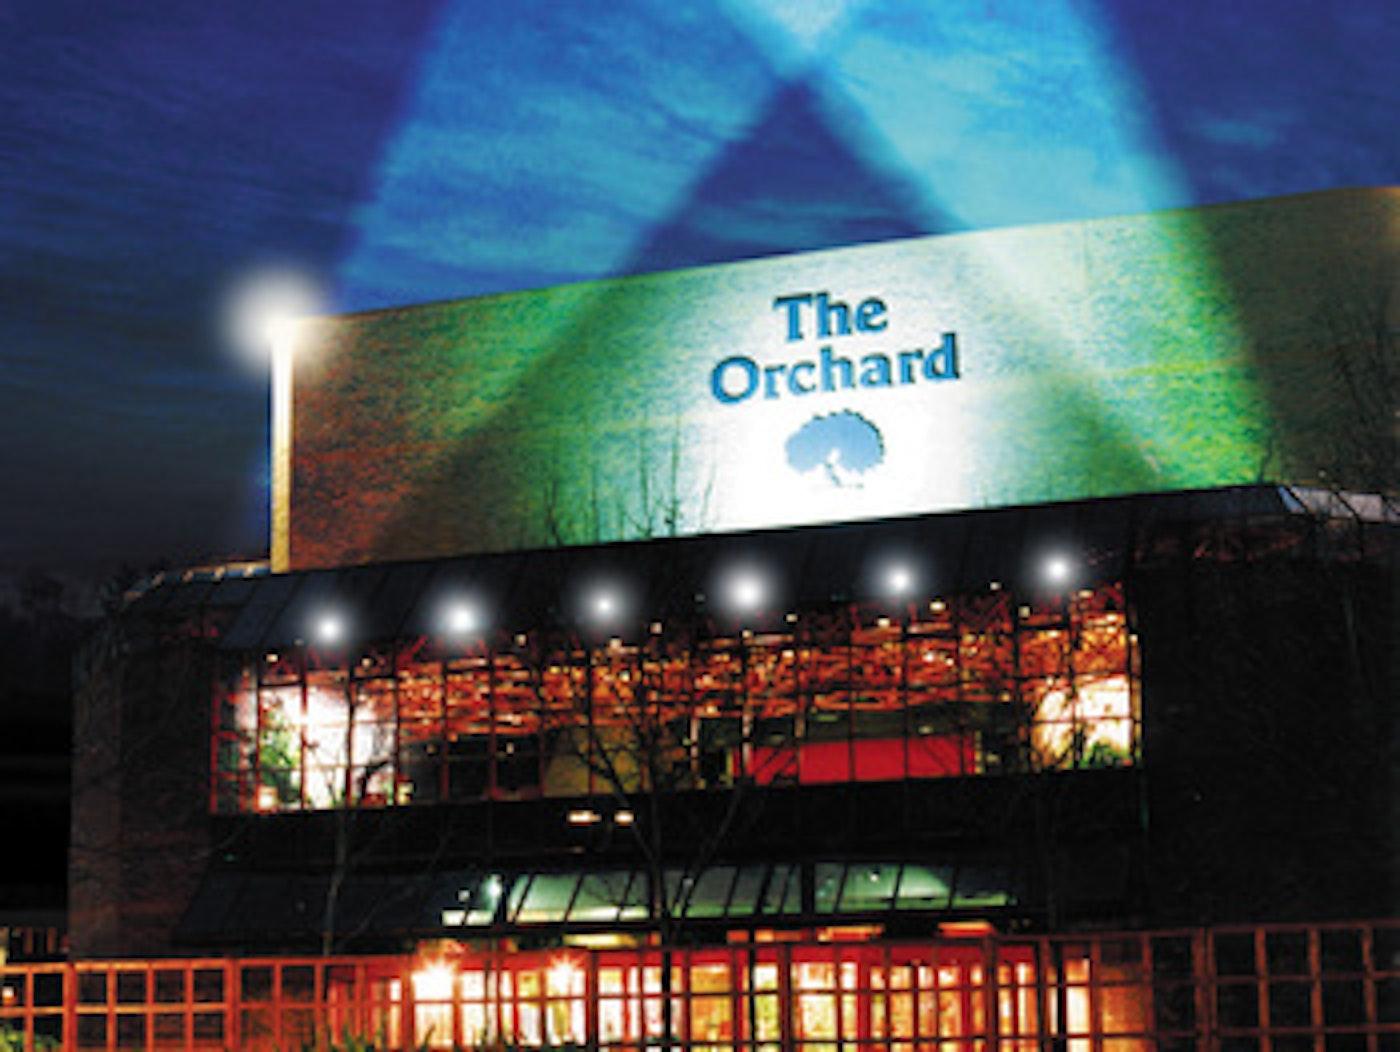 Orchard Theatre